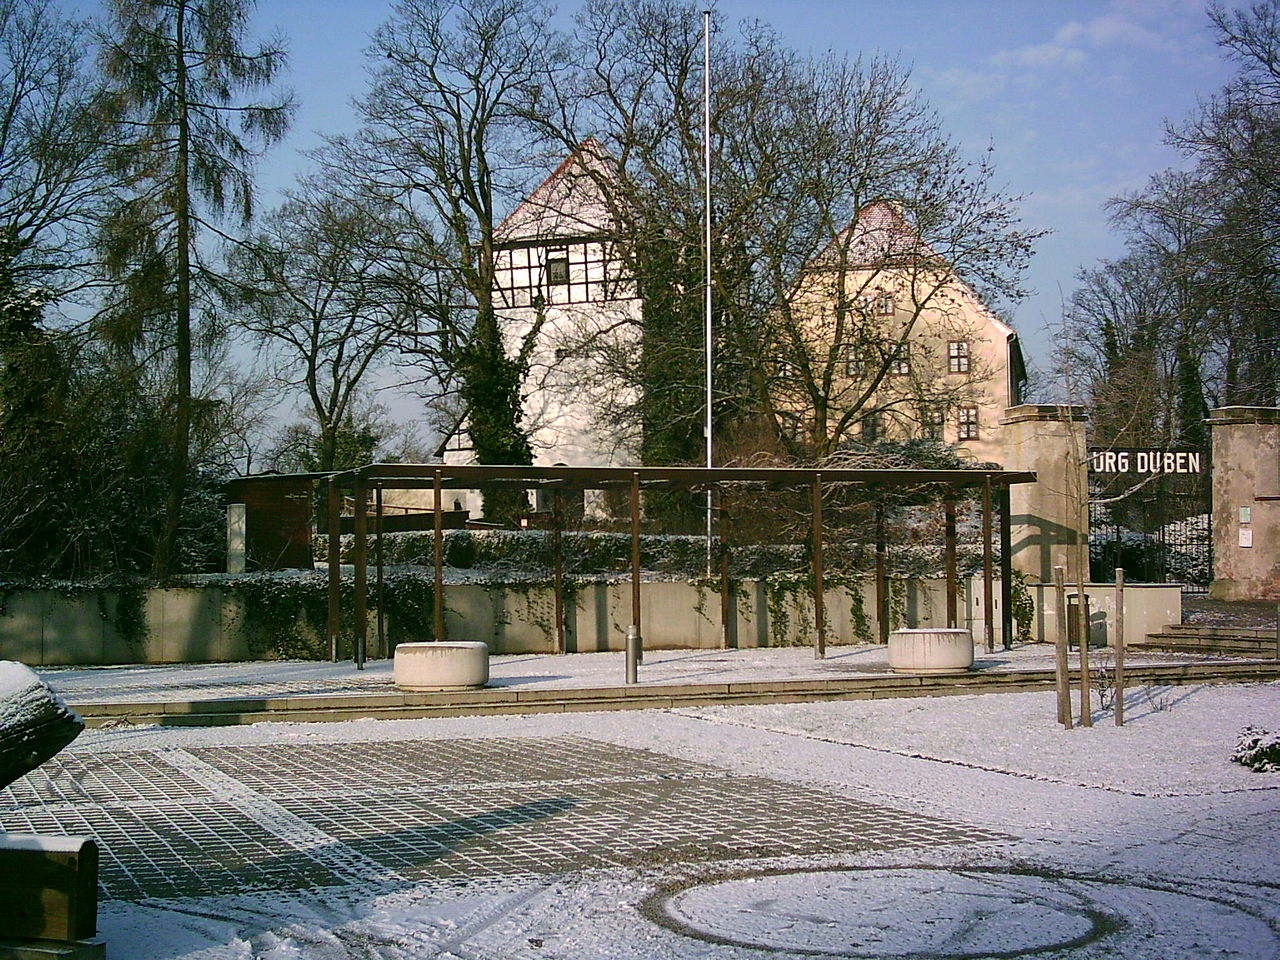 Bild Burg Düben